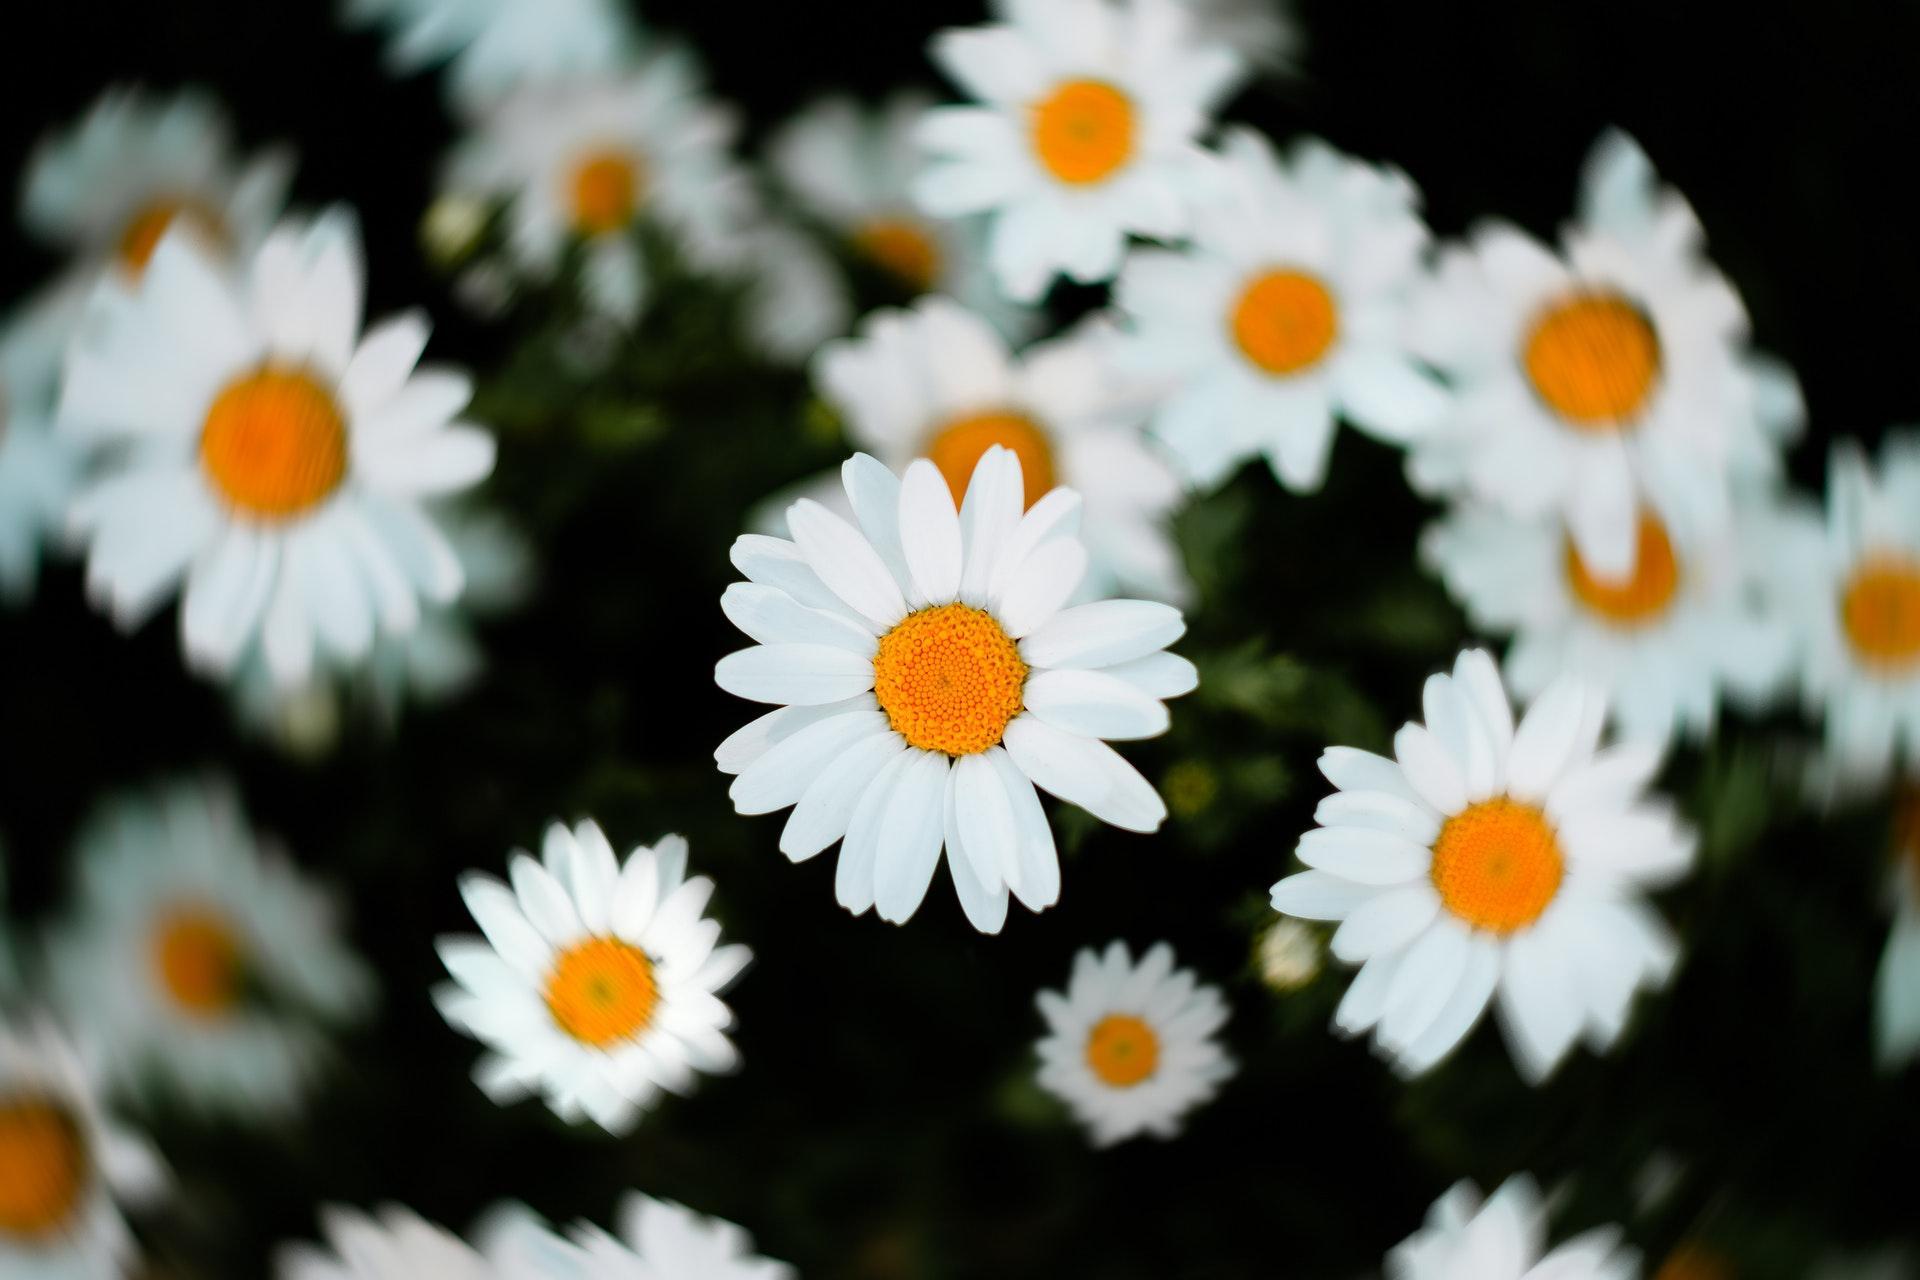 White flowers image